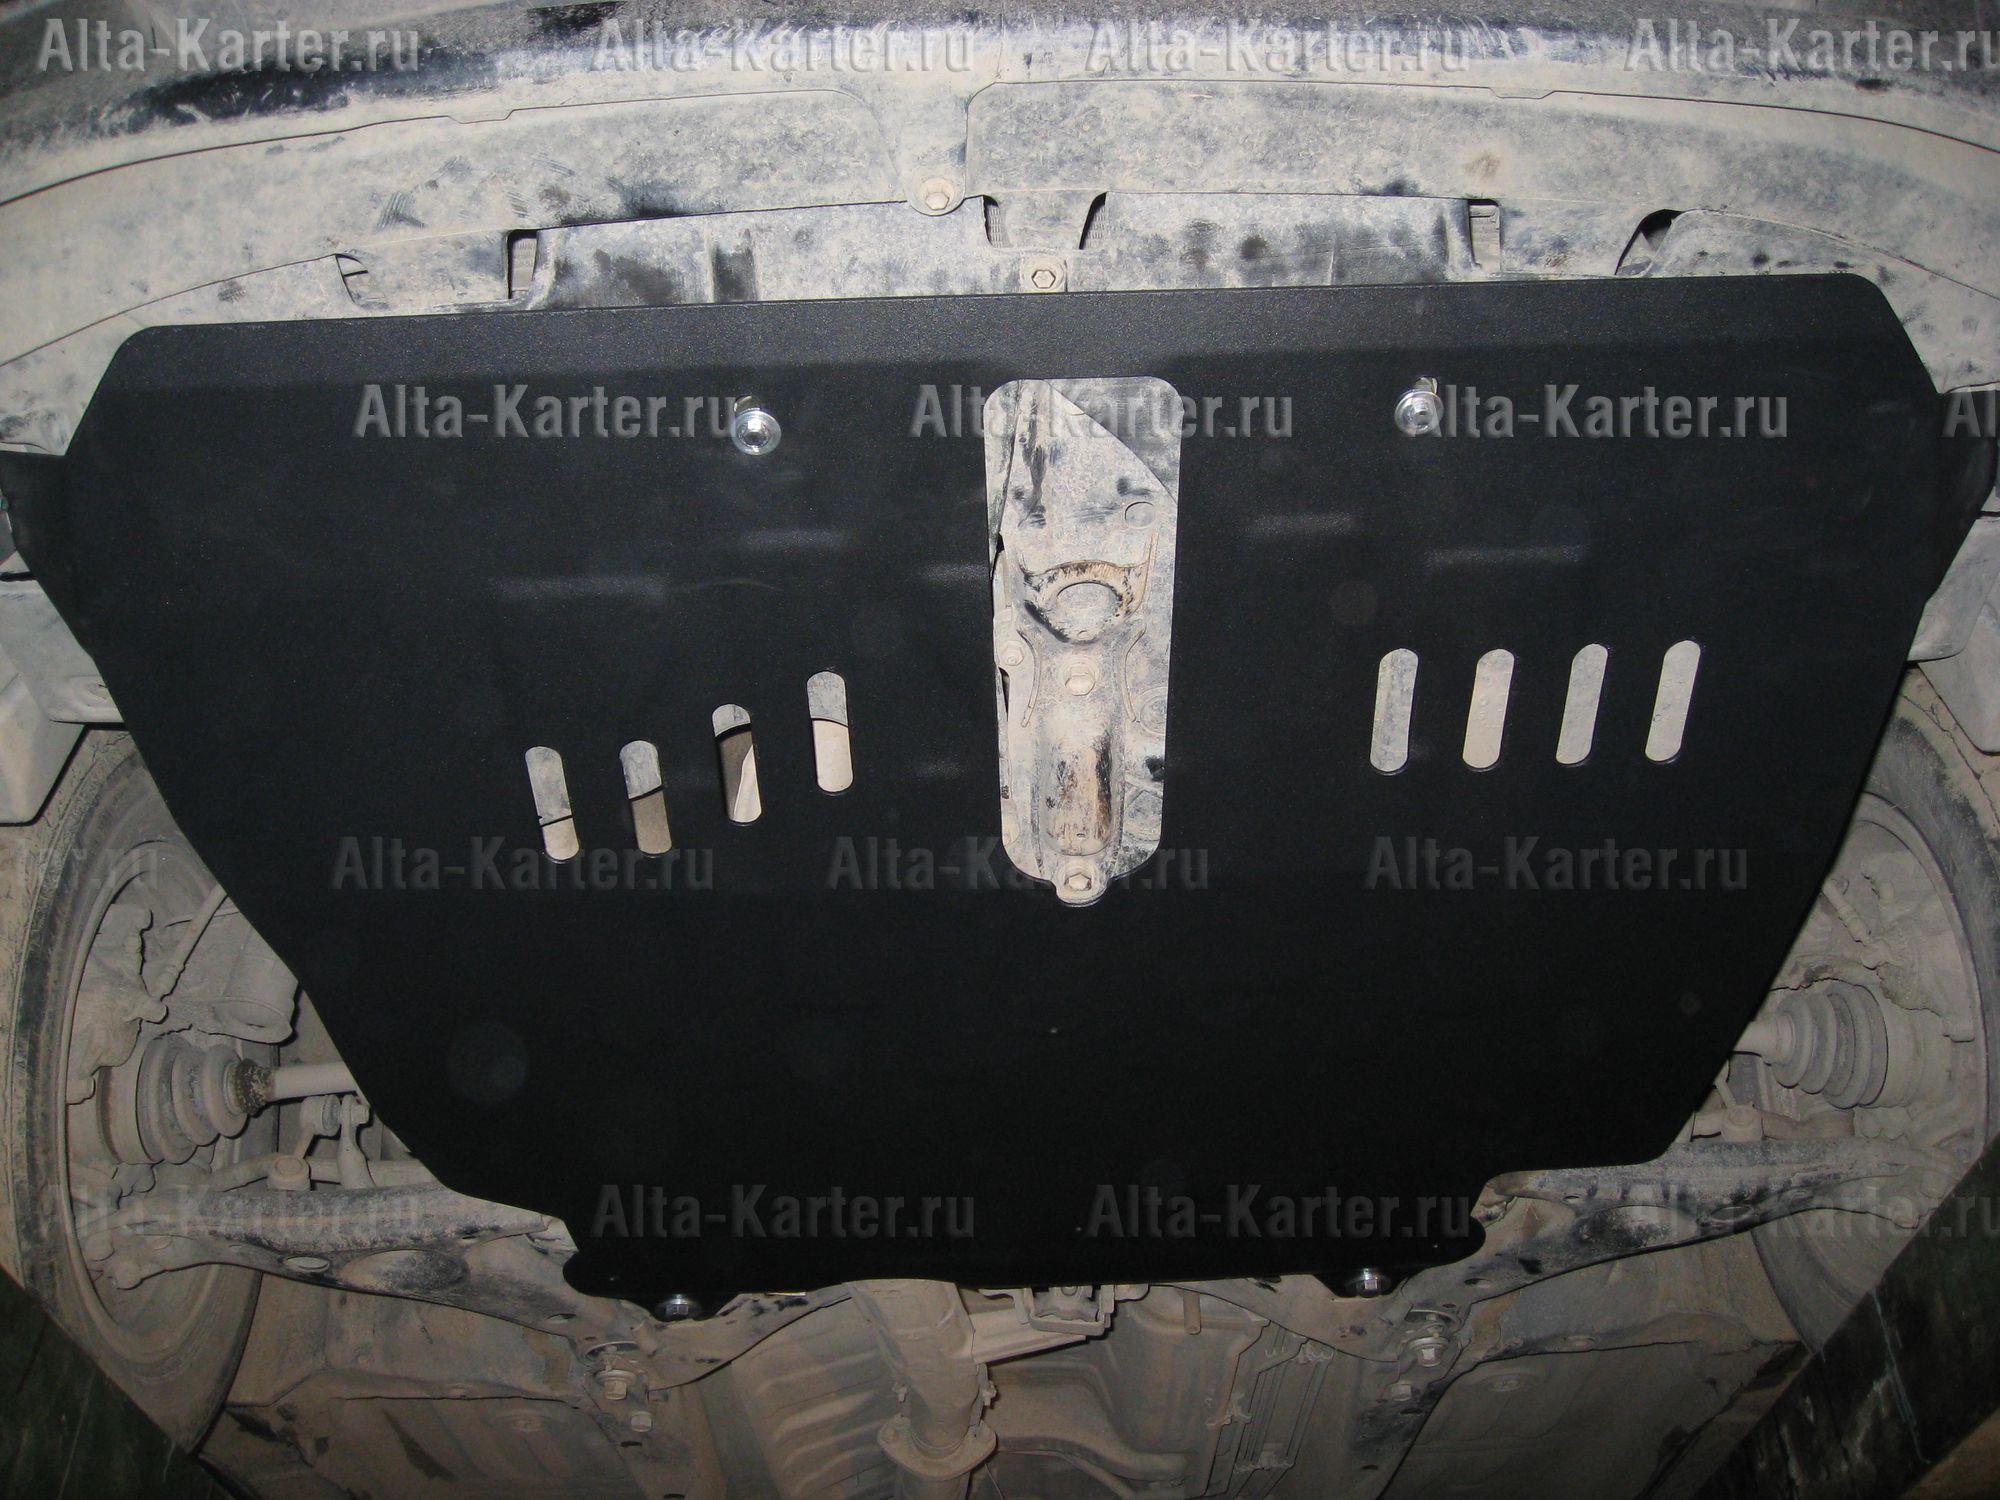 Защита Alfeco для картера и КПП Toyota Ipsum I 1996-2001. Артикул ALF.24.31